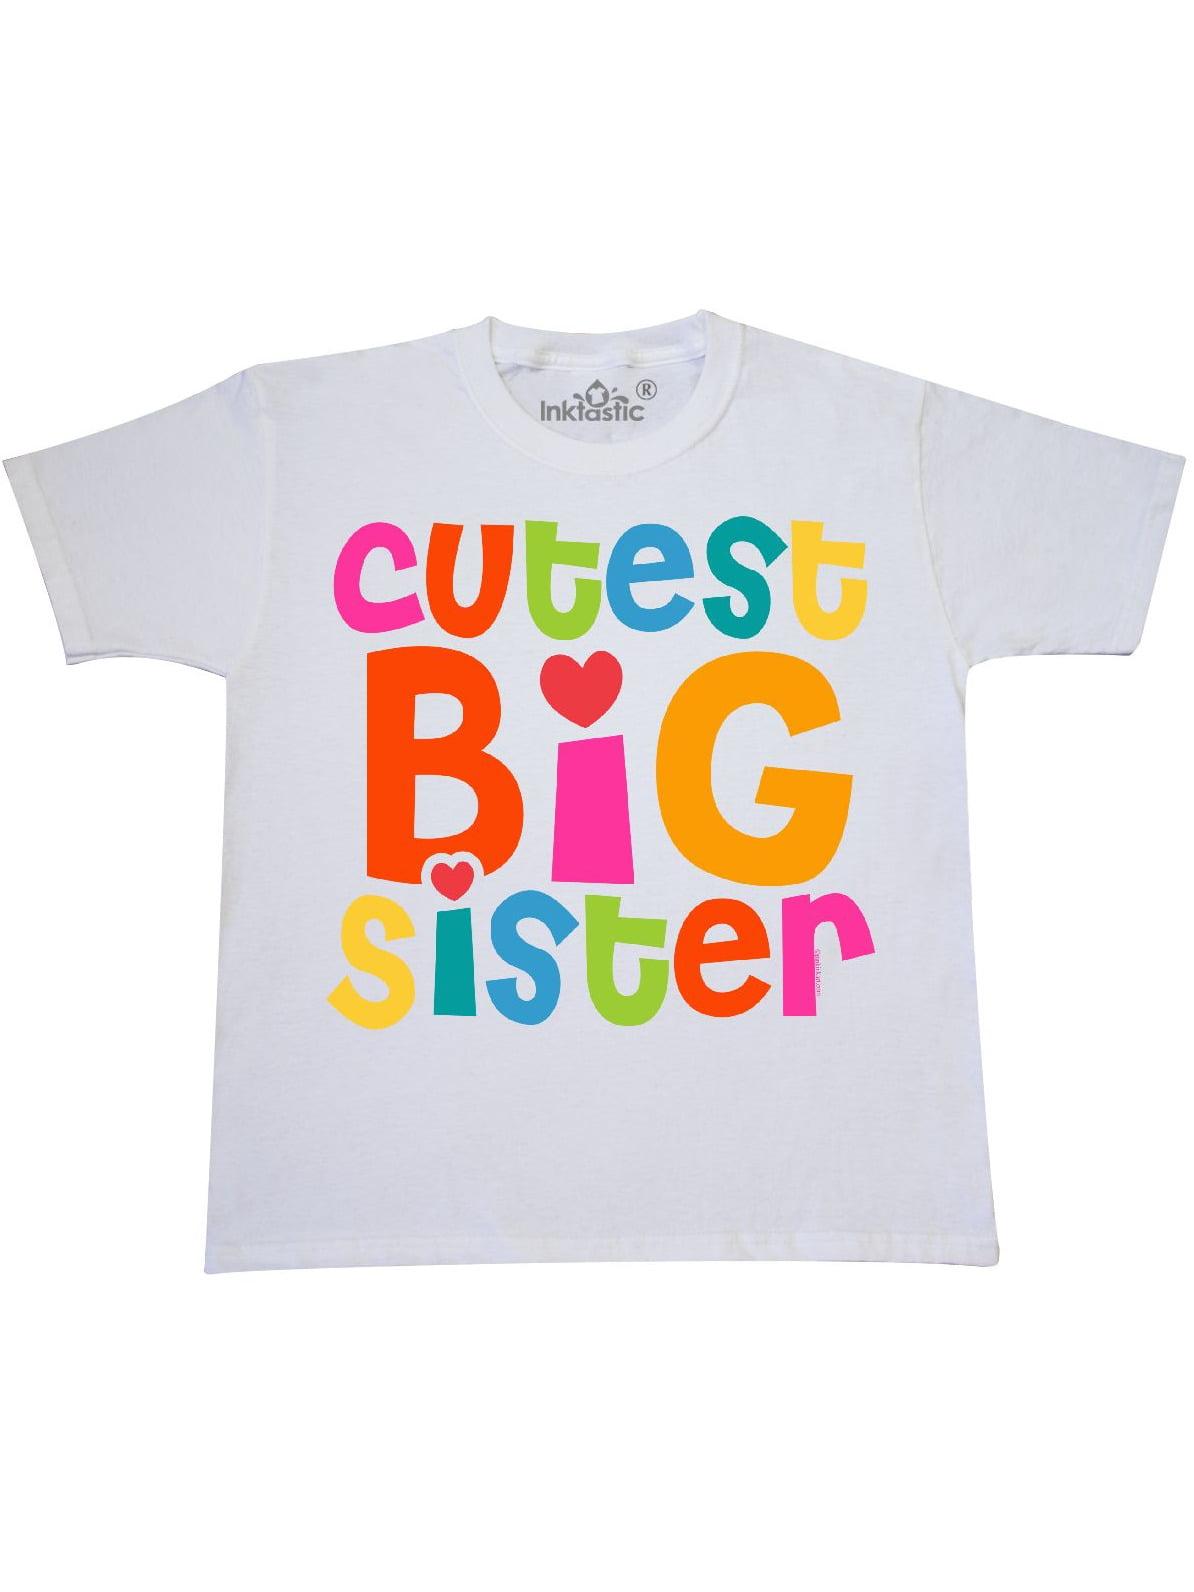 Cutest Big Sister Youth T-Shirt